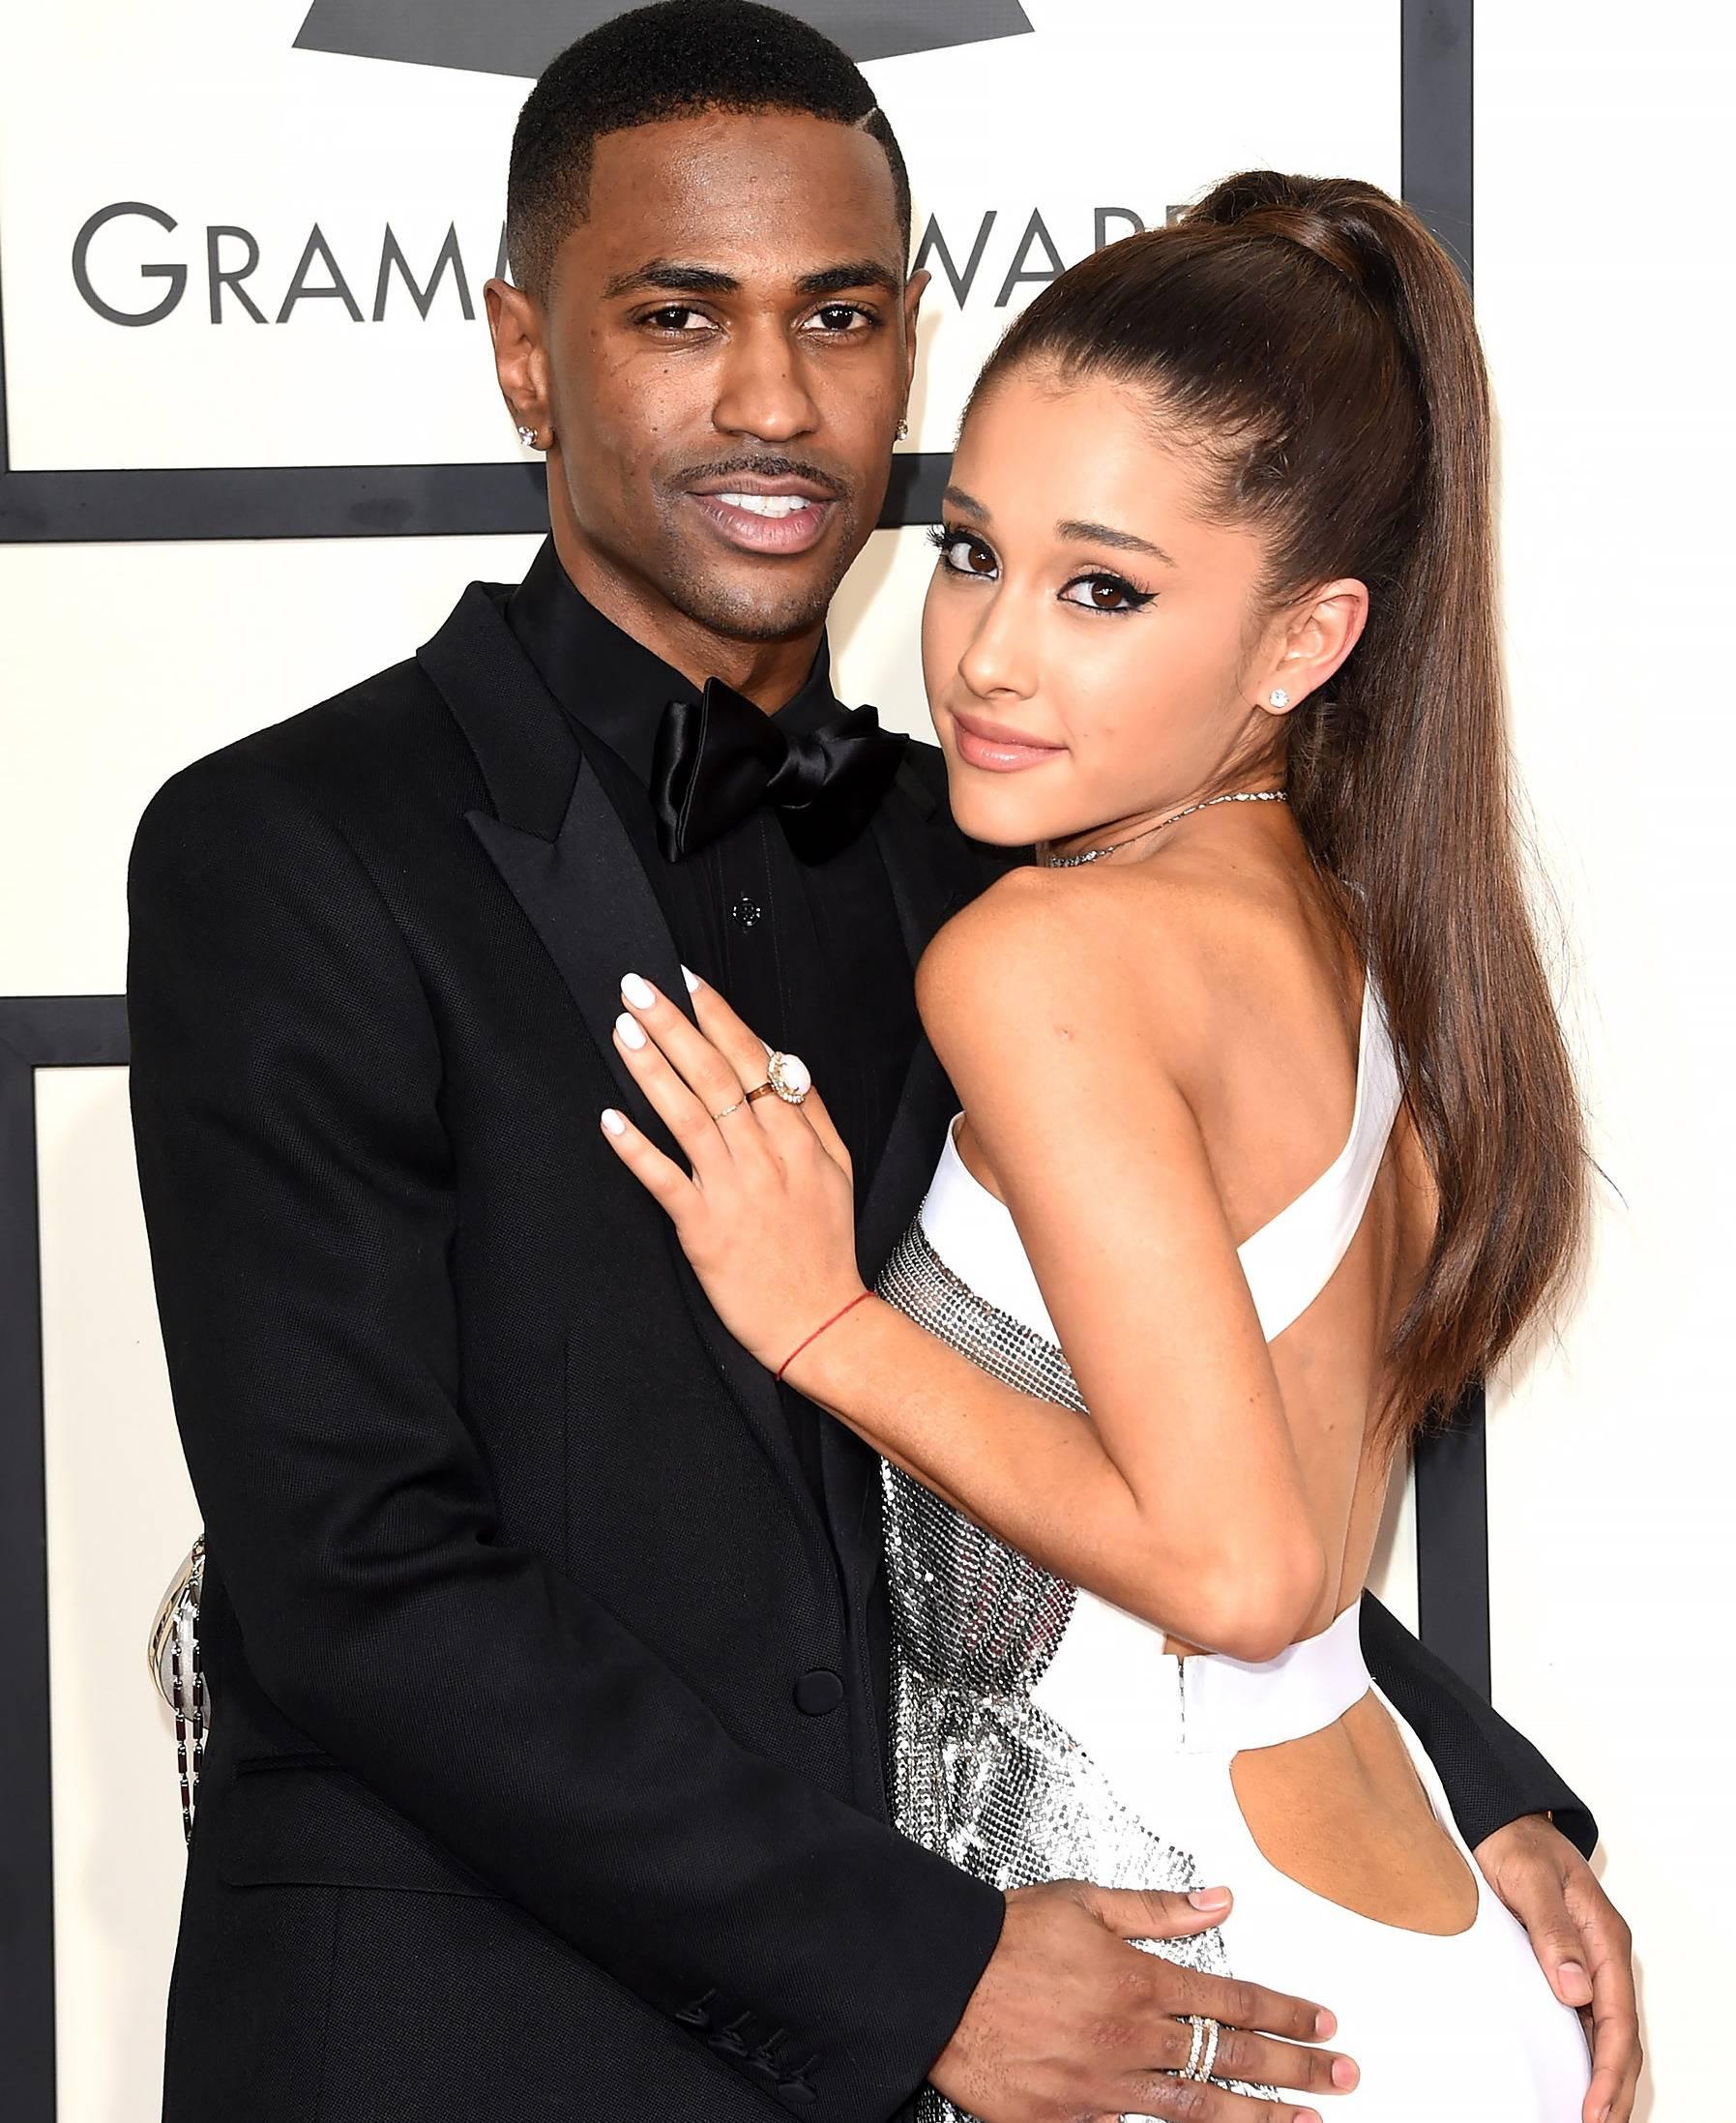 "Ariana Grande Big Sean ""data-caption ="" Ariana Grande and Big Sean "". Data-source ="" @ people.com"